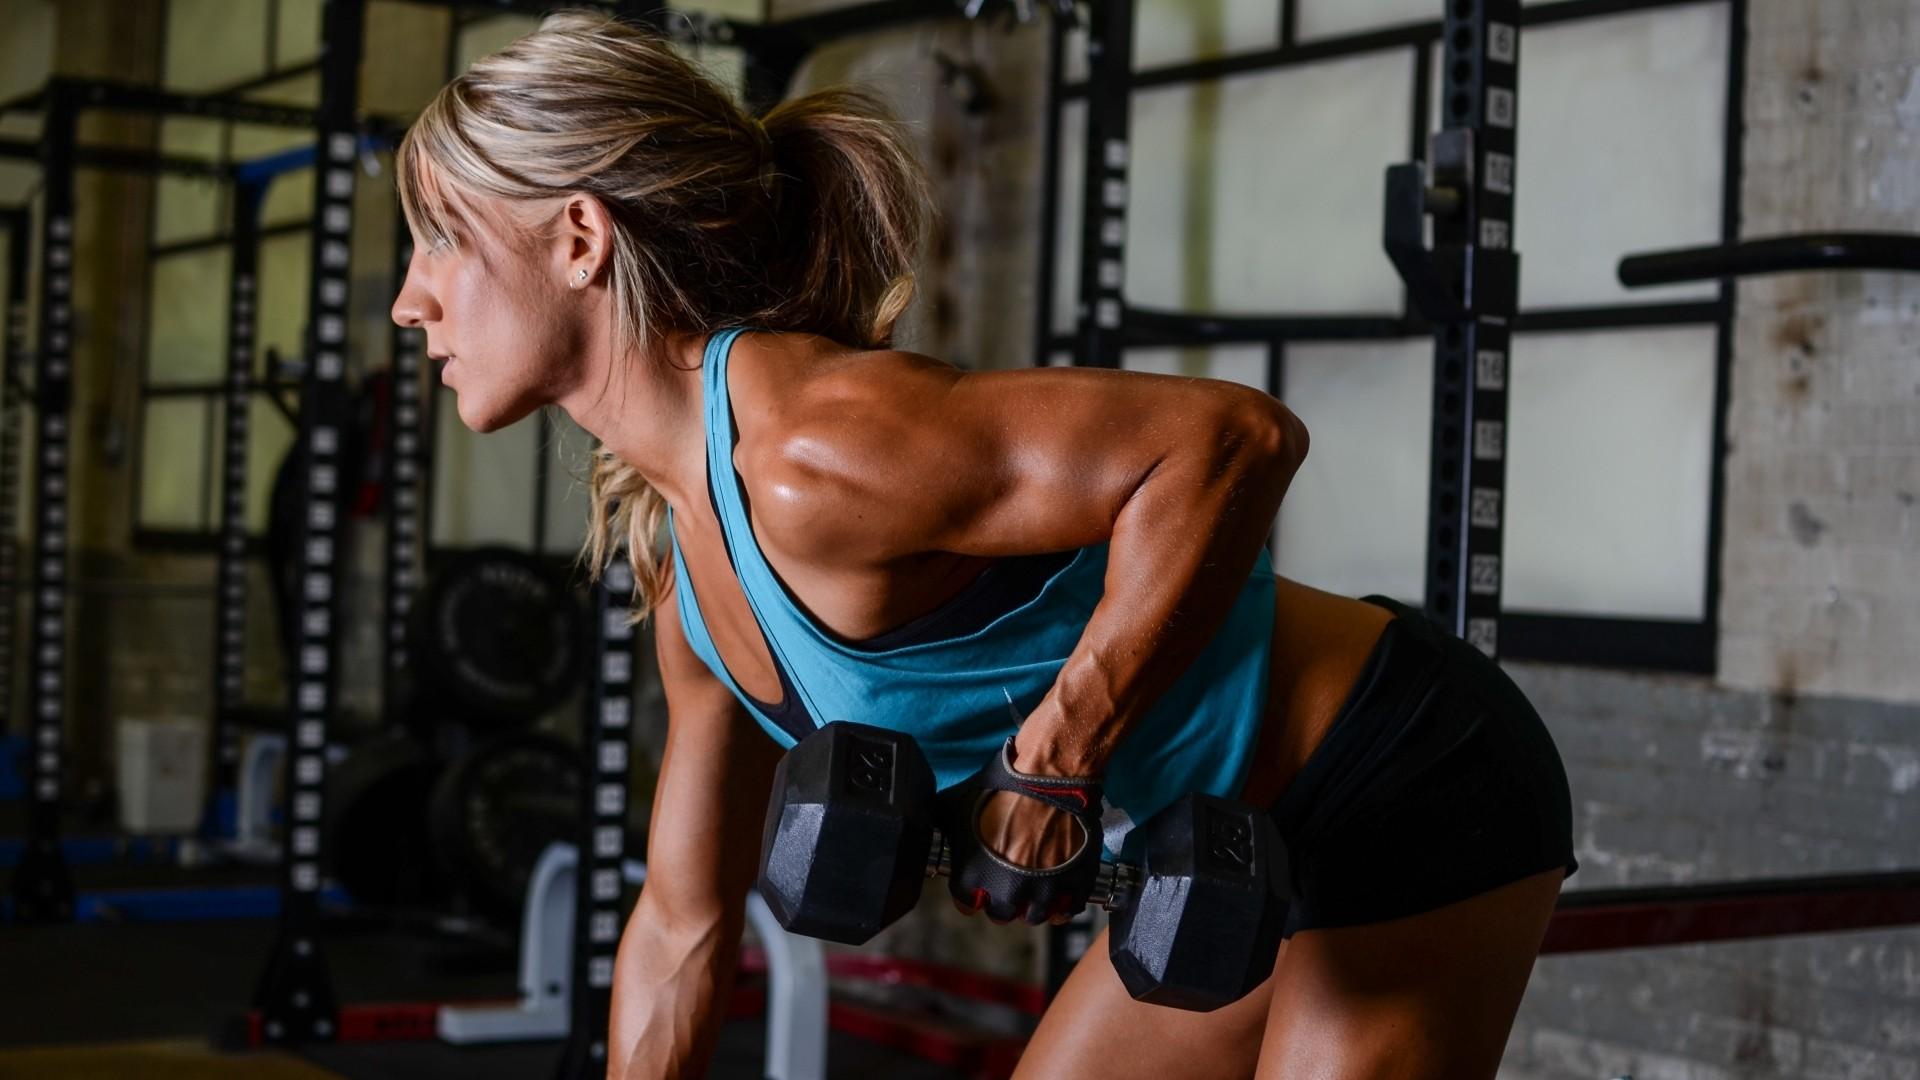 Wallpaper sports women room skinny gyms fitness